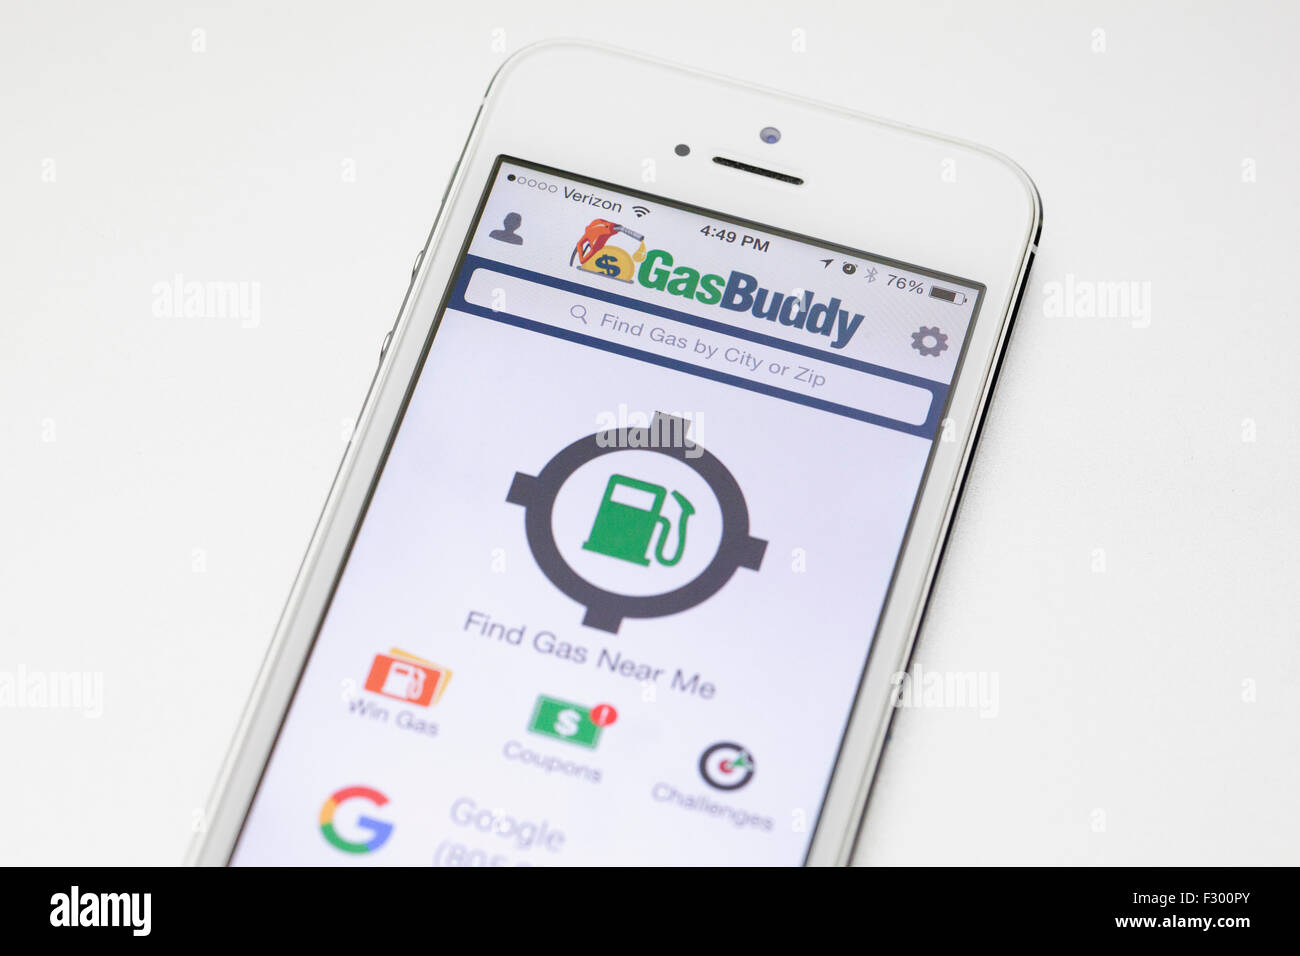 Gas Buddy app on iPhone screen - USA - Stock Image